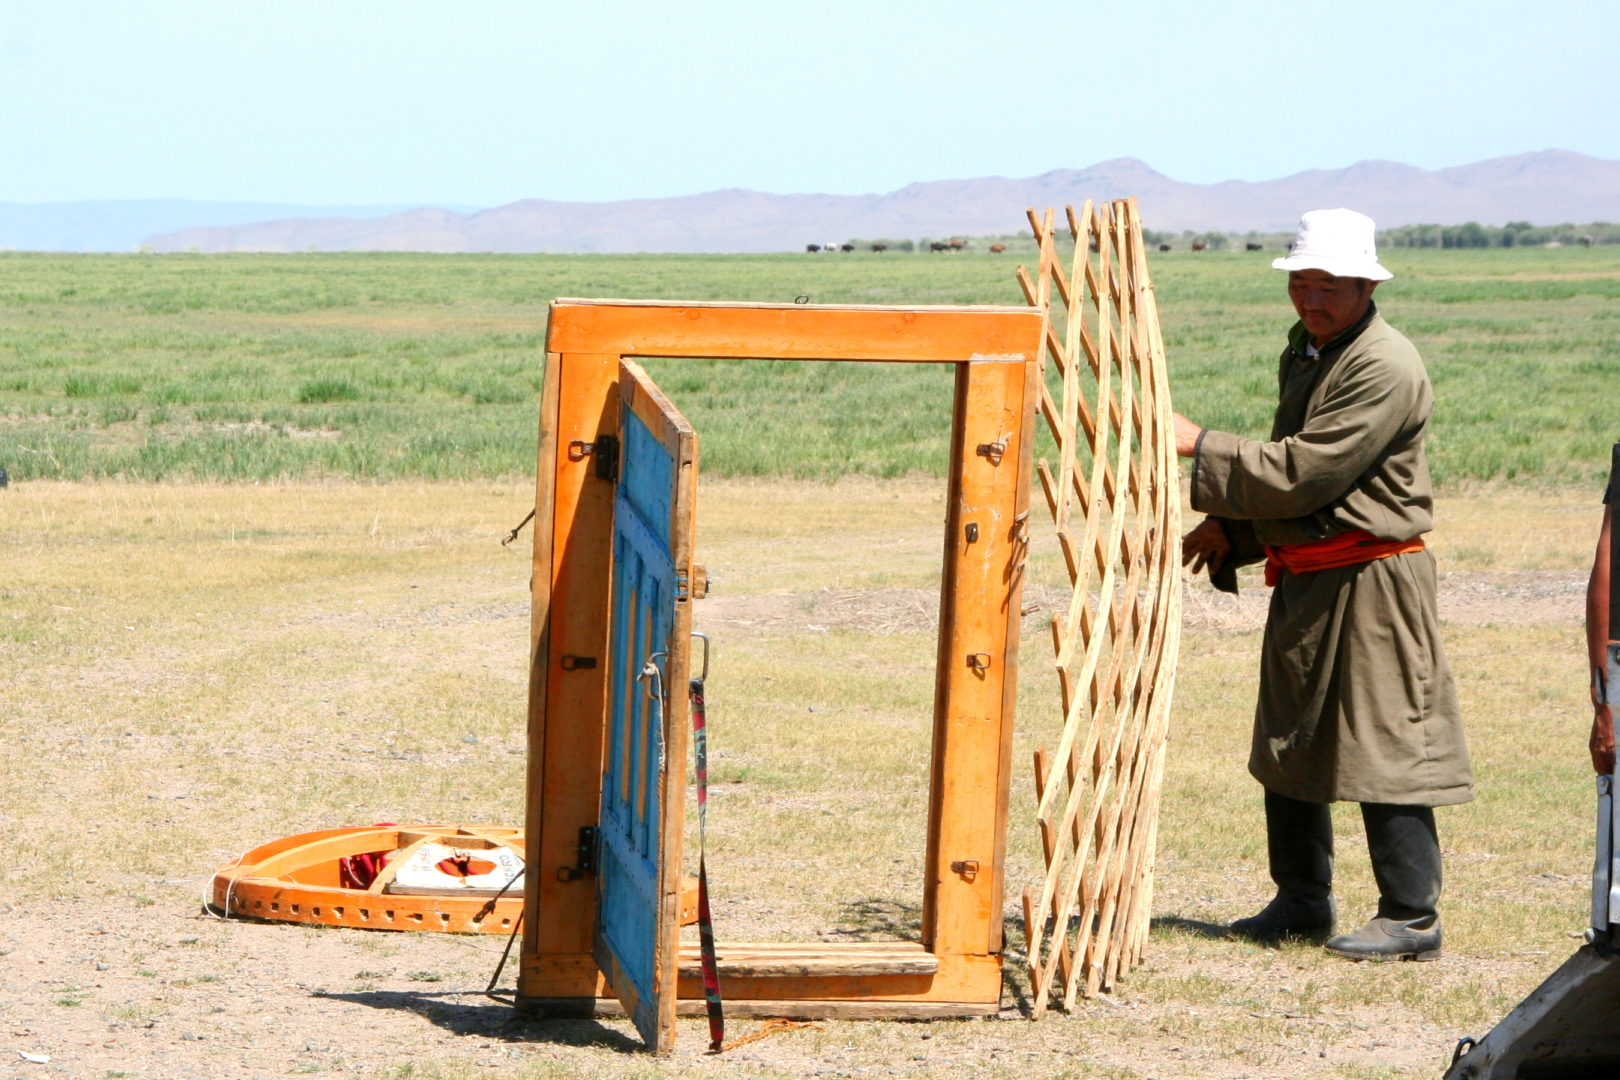 Mongolische Jurte (Ger) - Aufbau